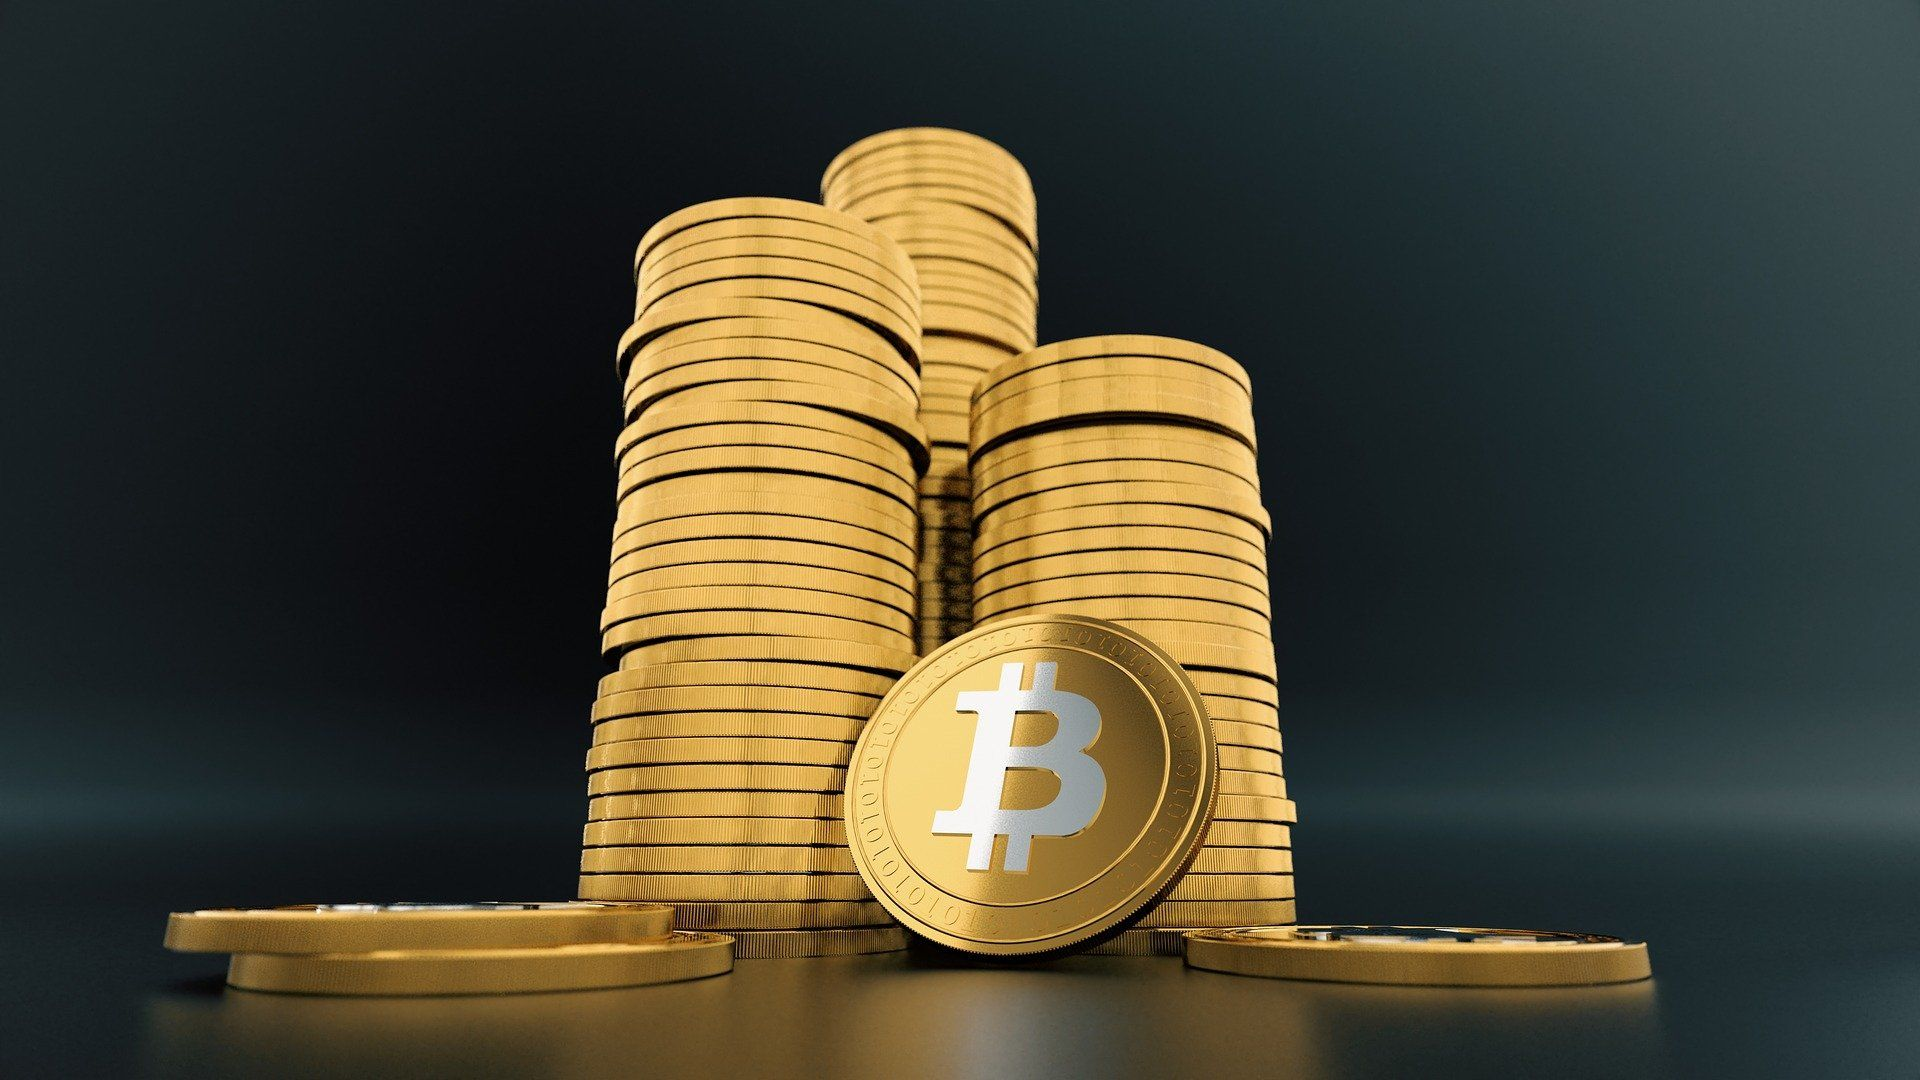 Investasi Kripto vs Trading Kripto, Mana yang Lebih Cuan?